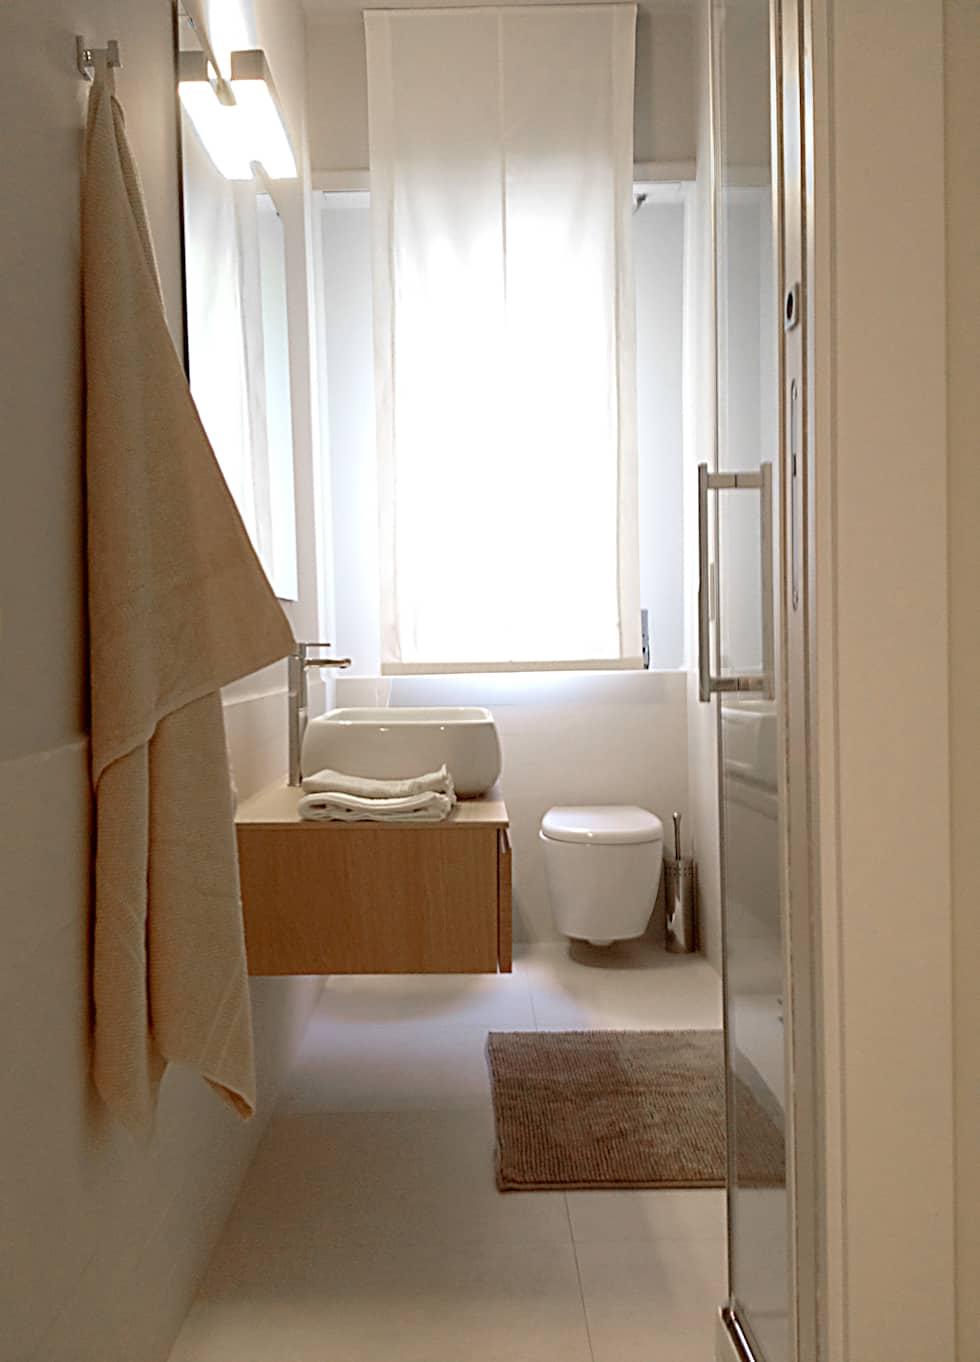 noemi moauro의 욕실